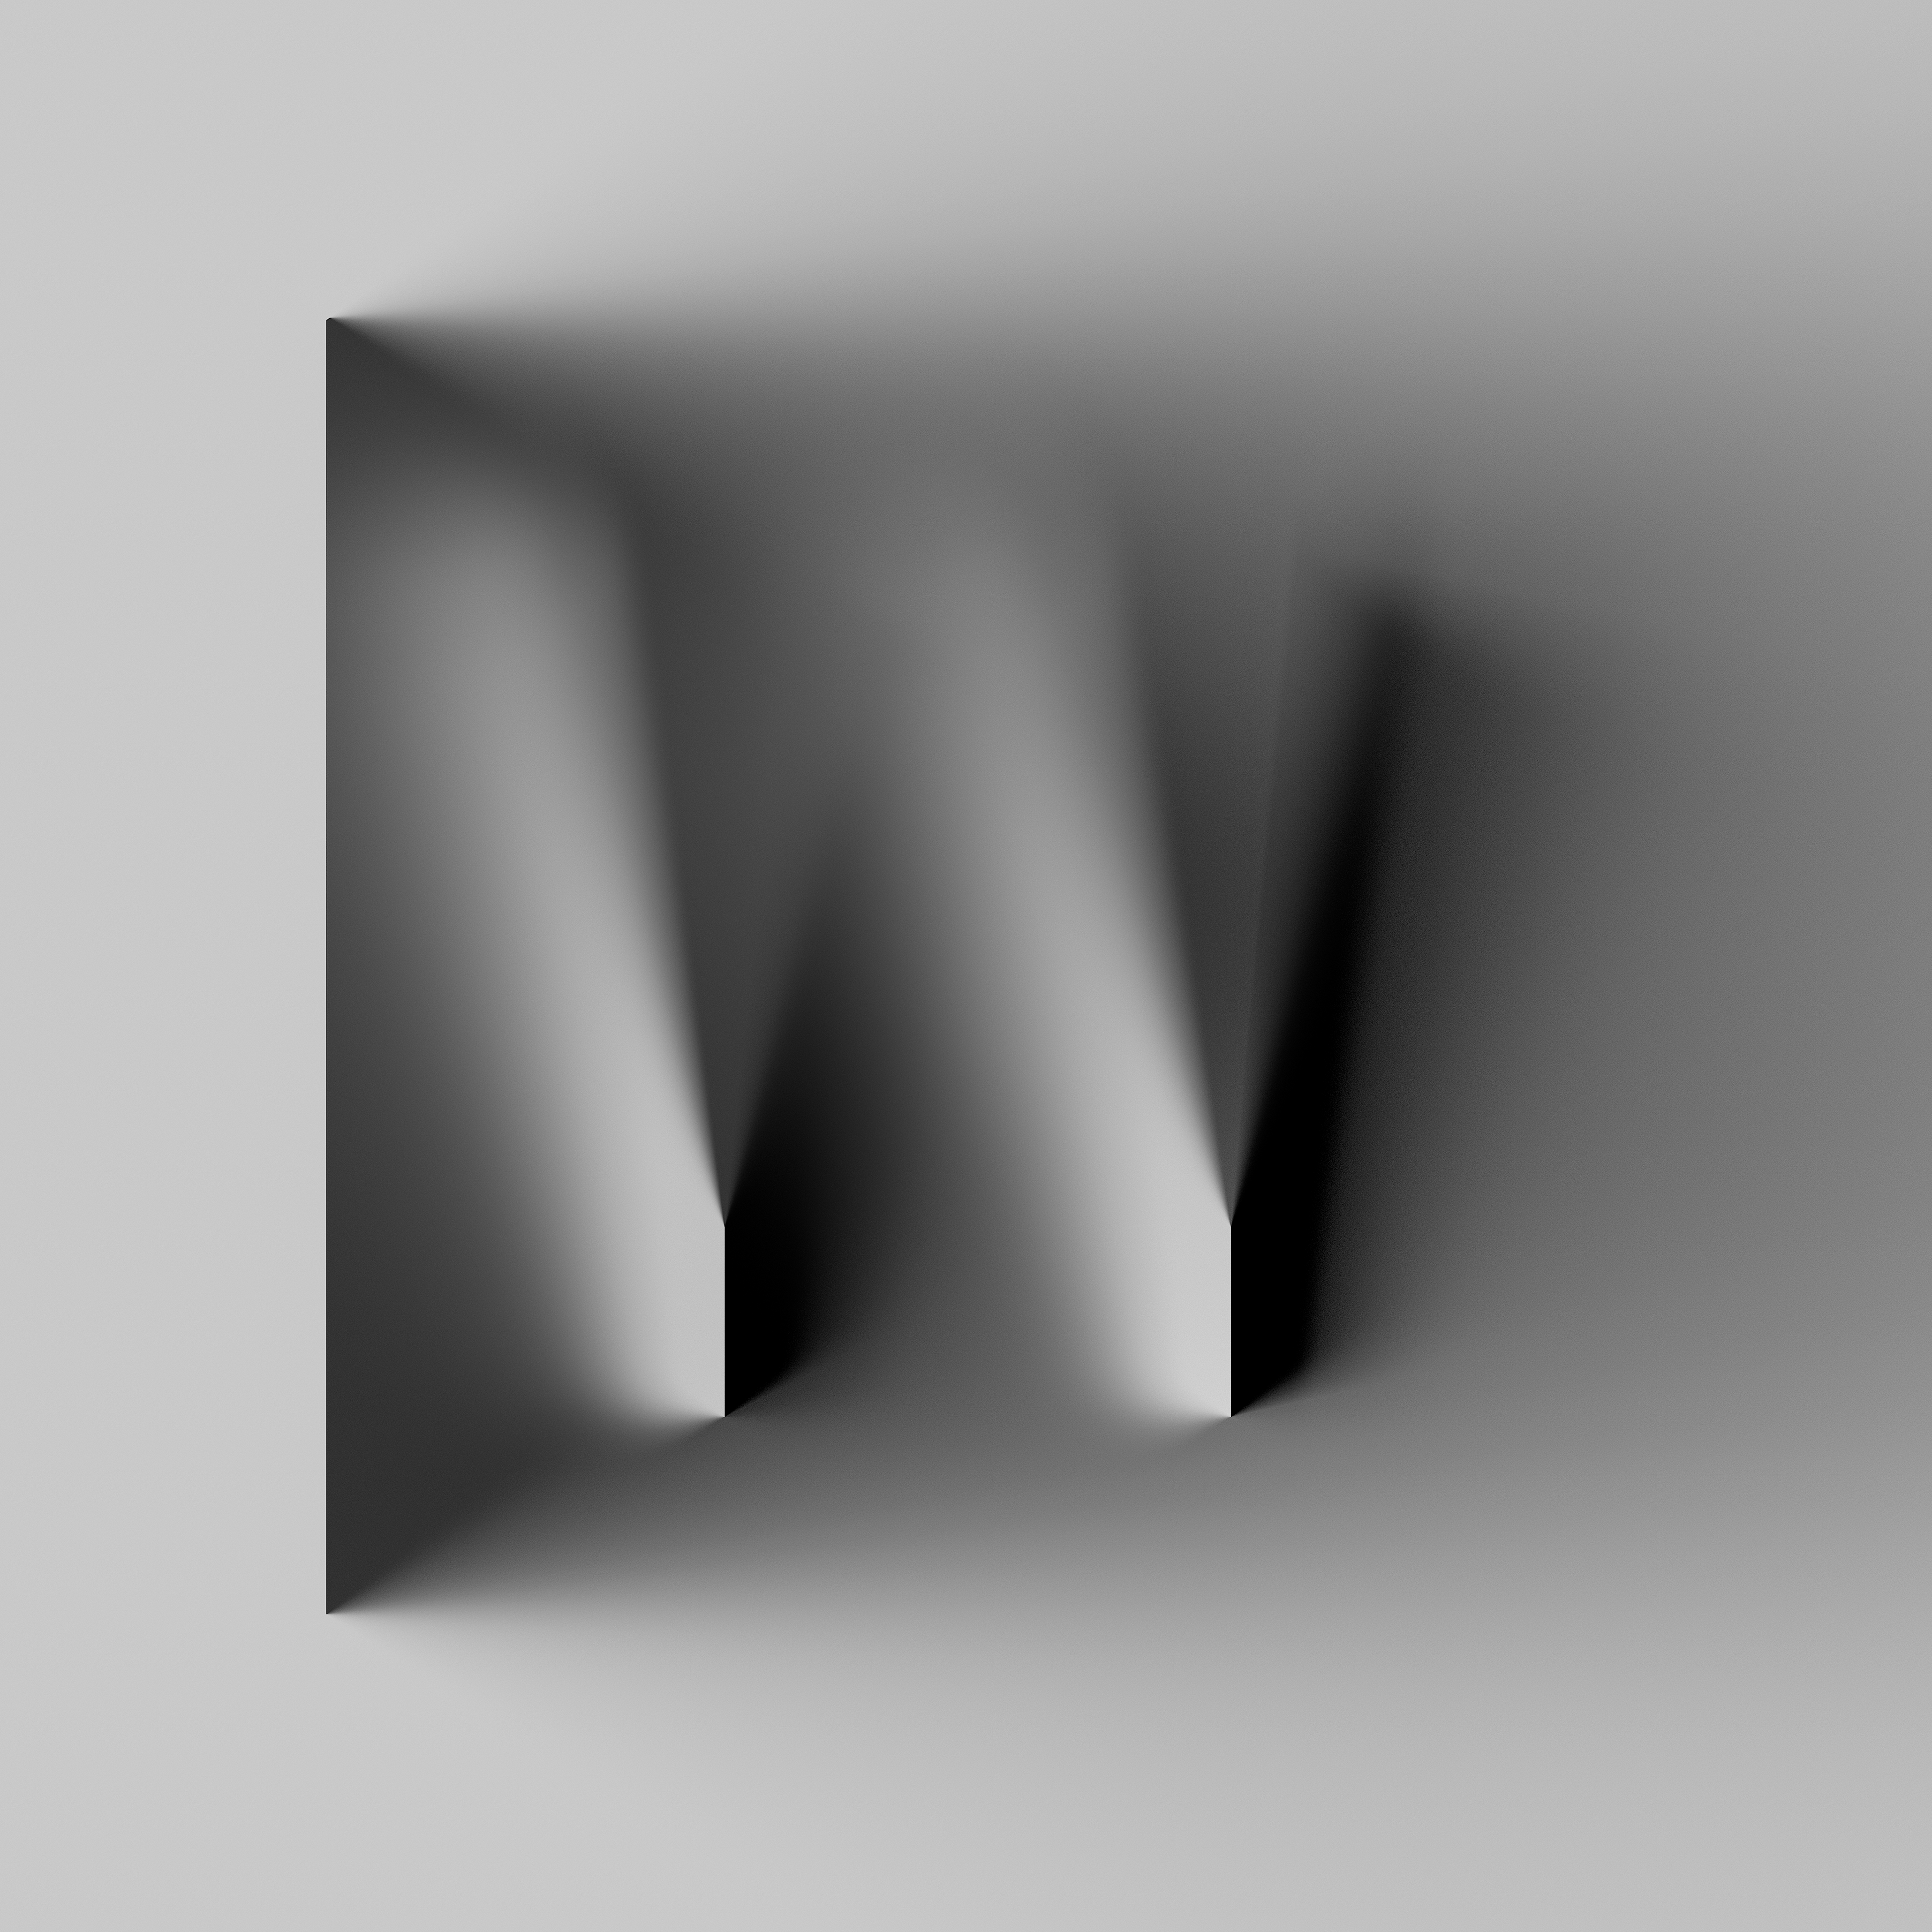 Pin On 2d Art Design